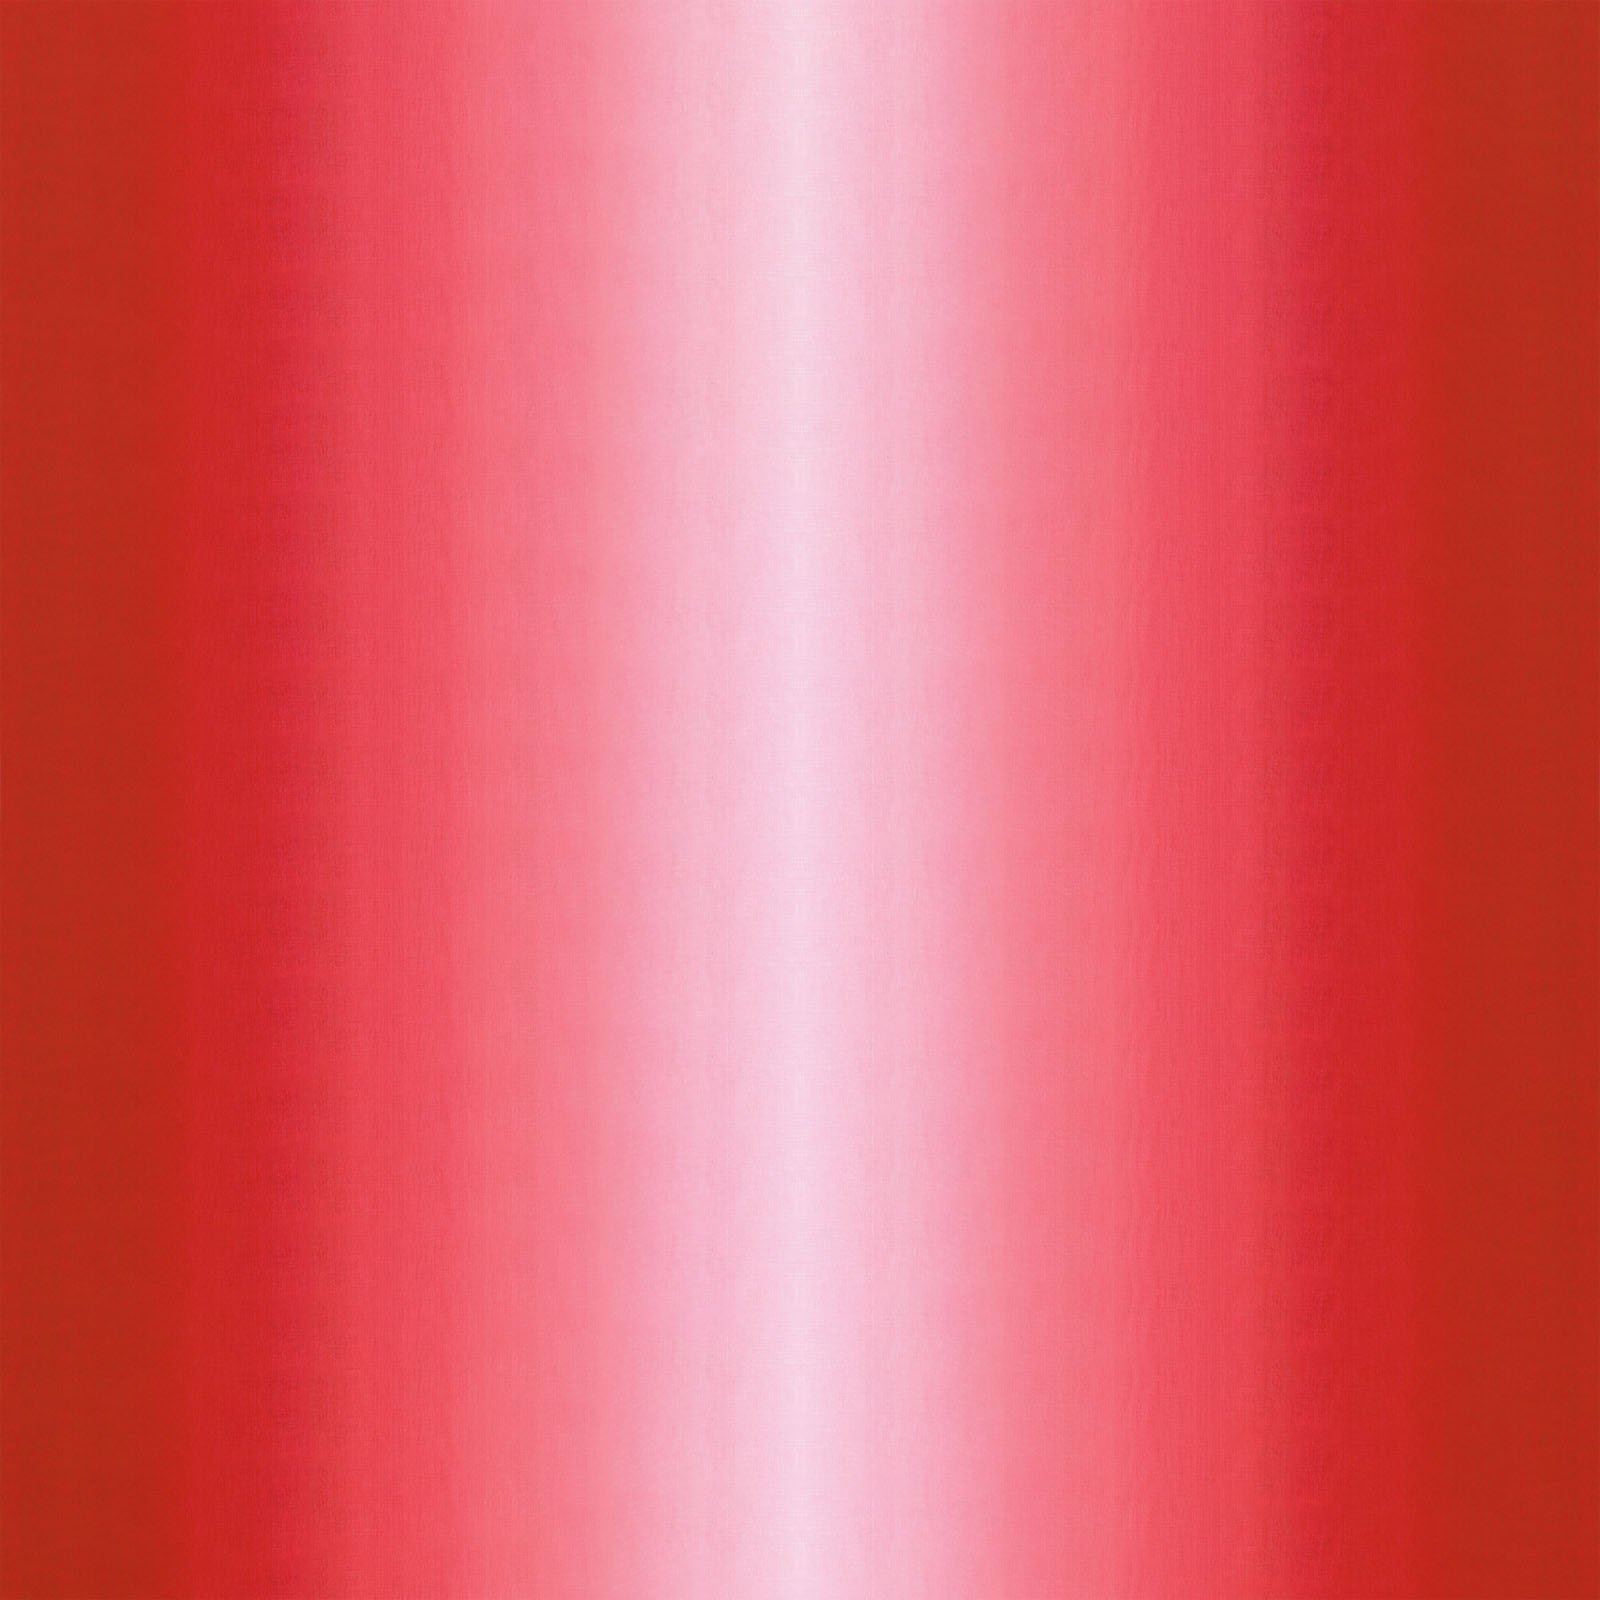 EESC-11216 P2 - GELATO OMBRE BY MAYWOOD PINK TONAL